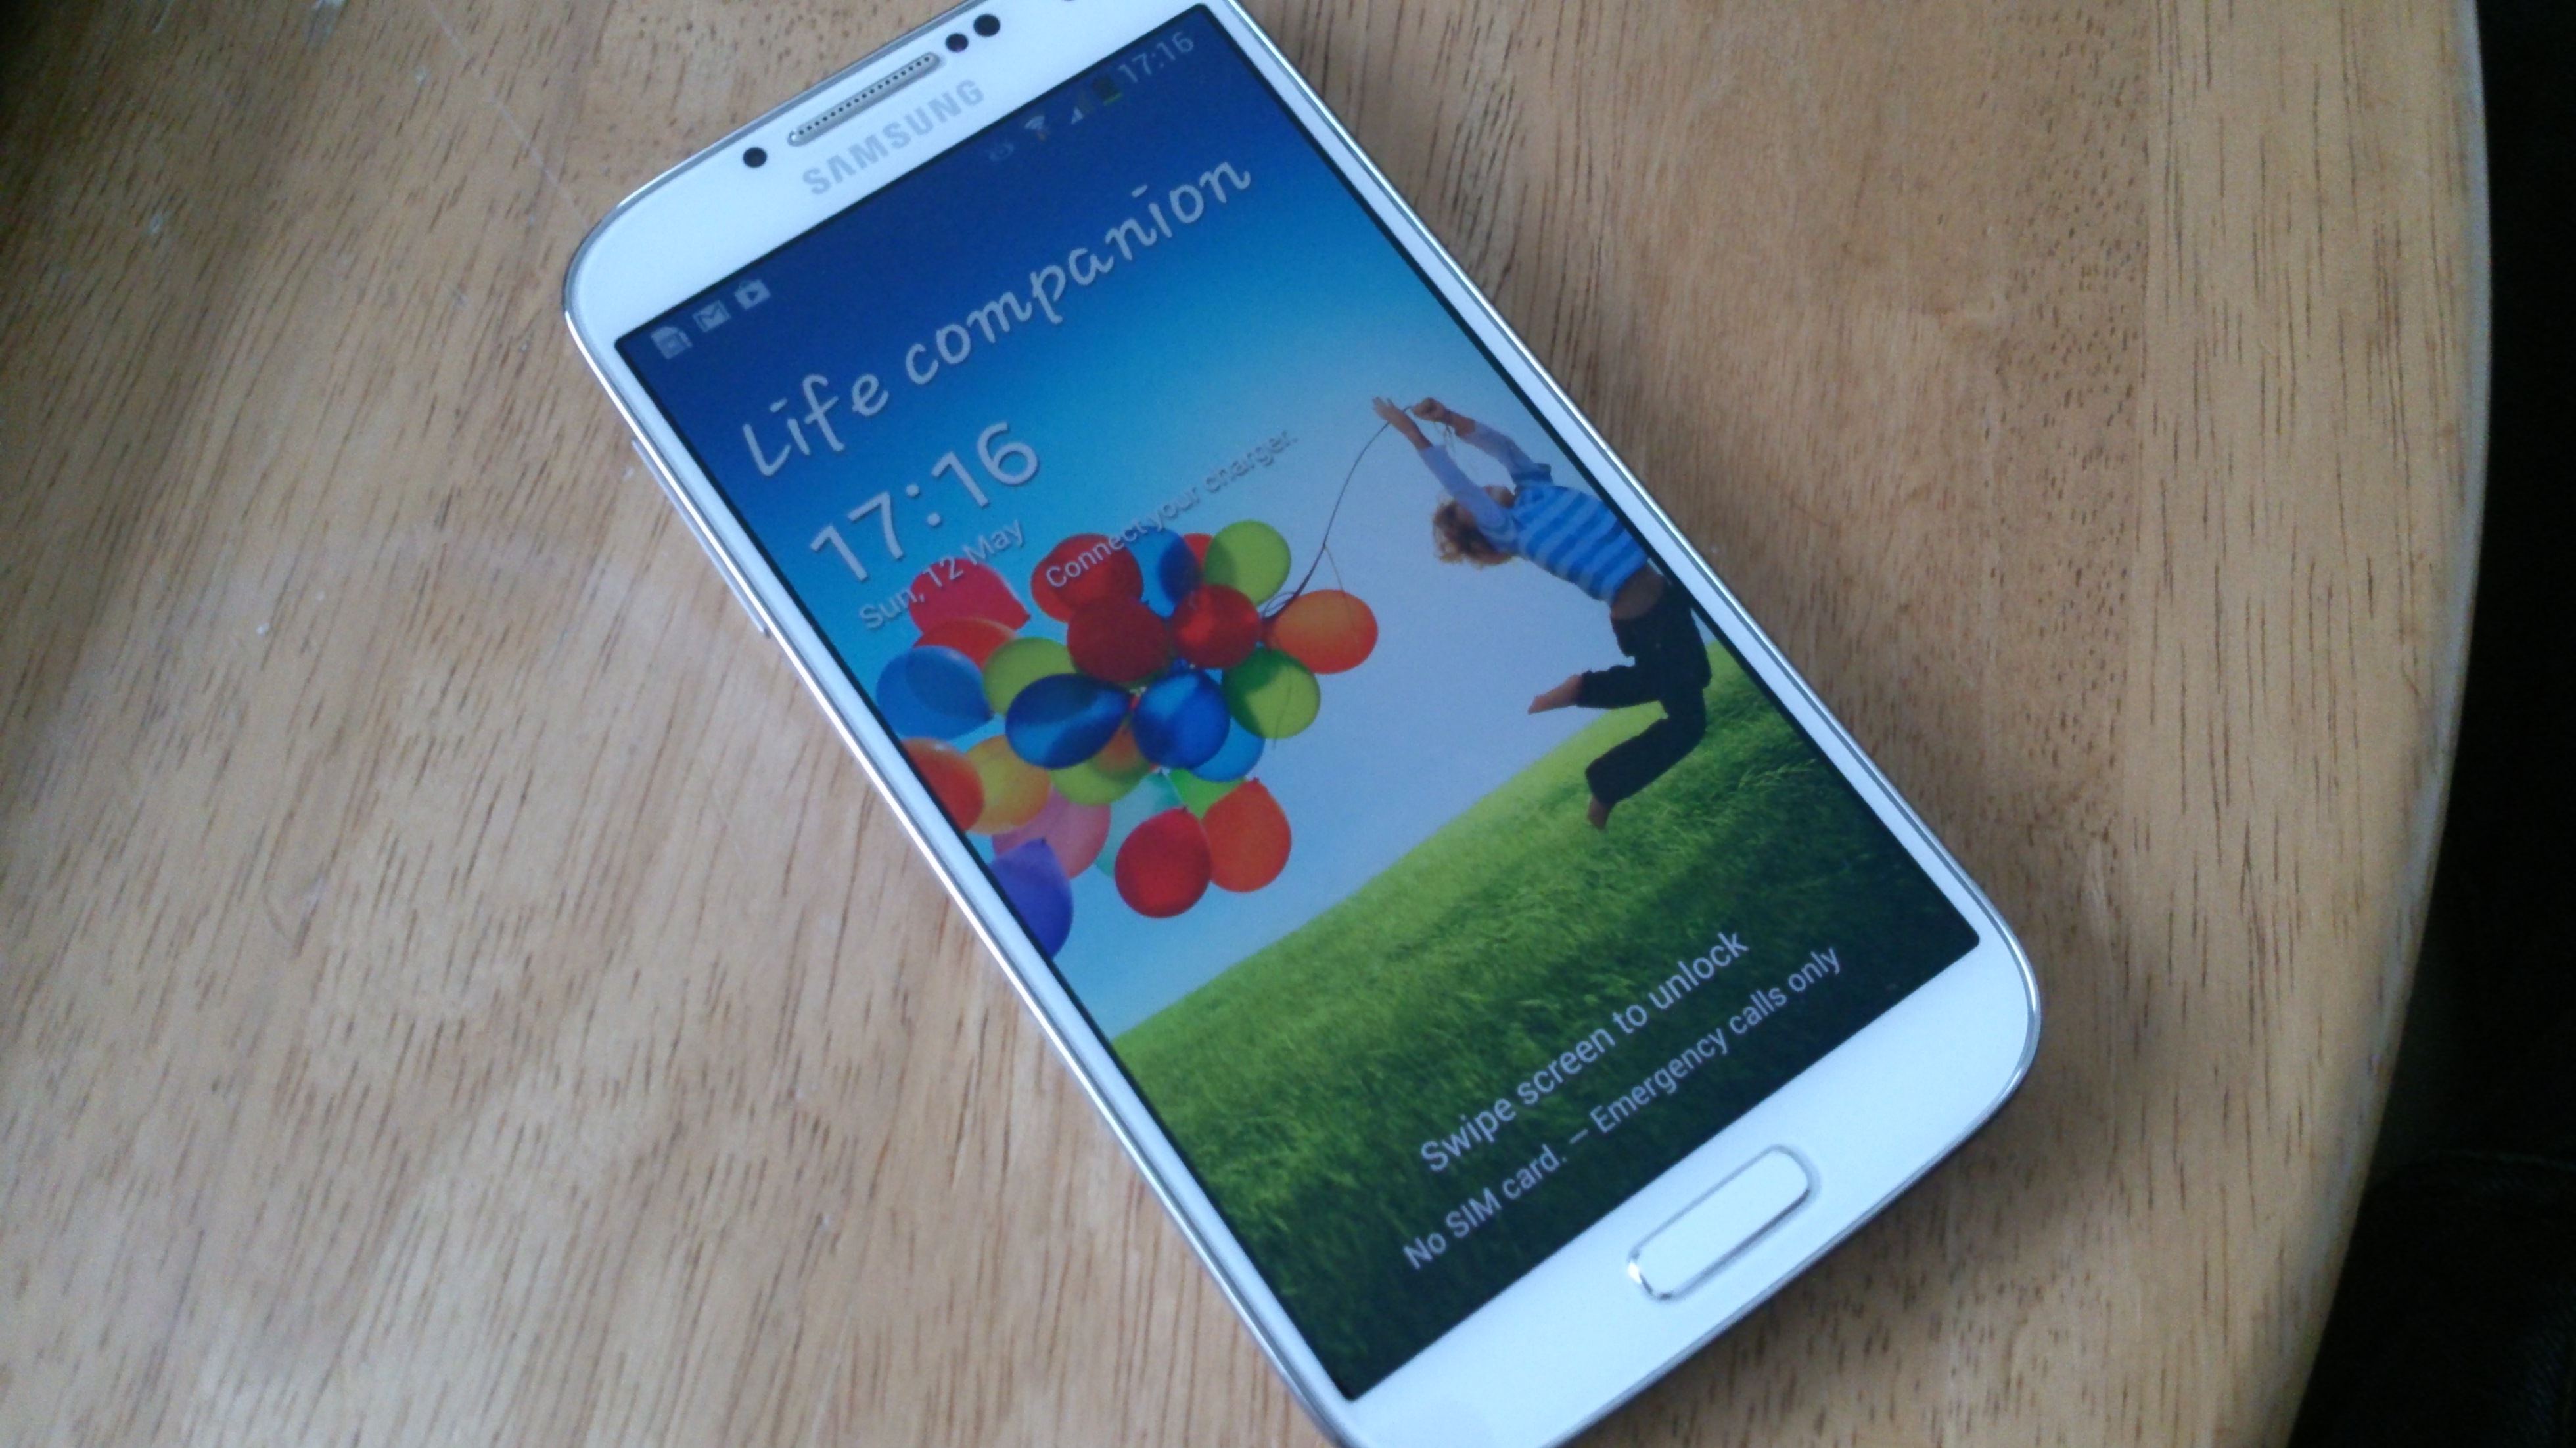 Samsung galaxy s4 deals at vodacom